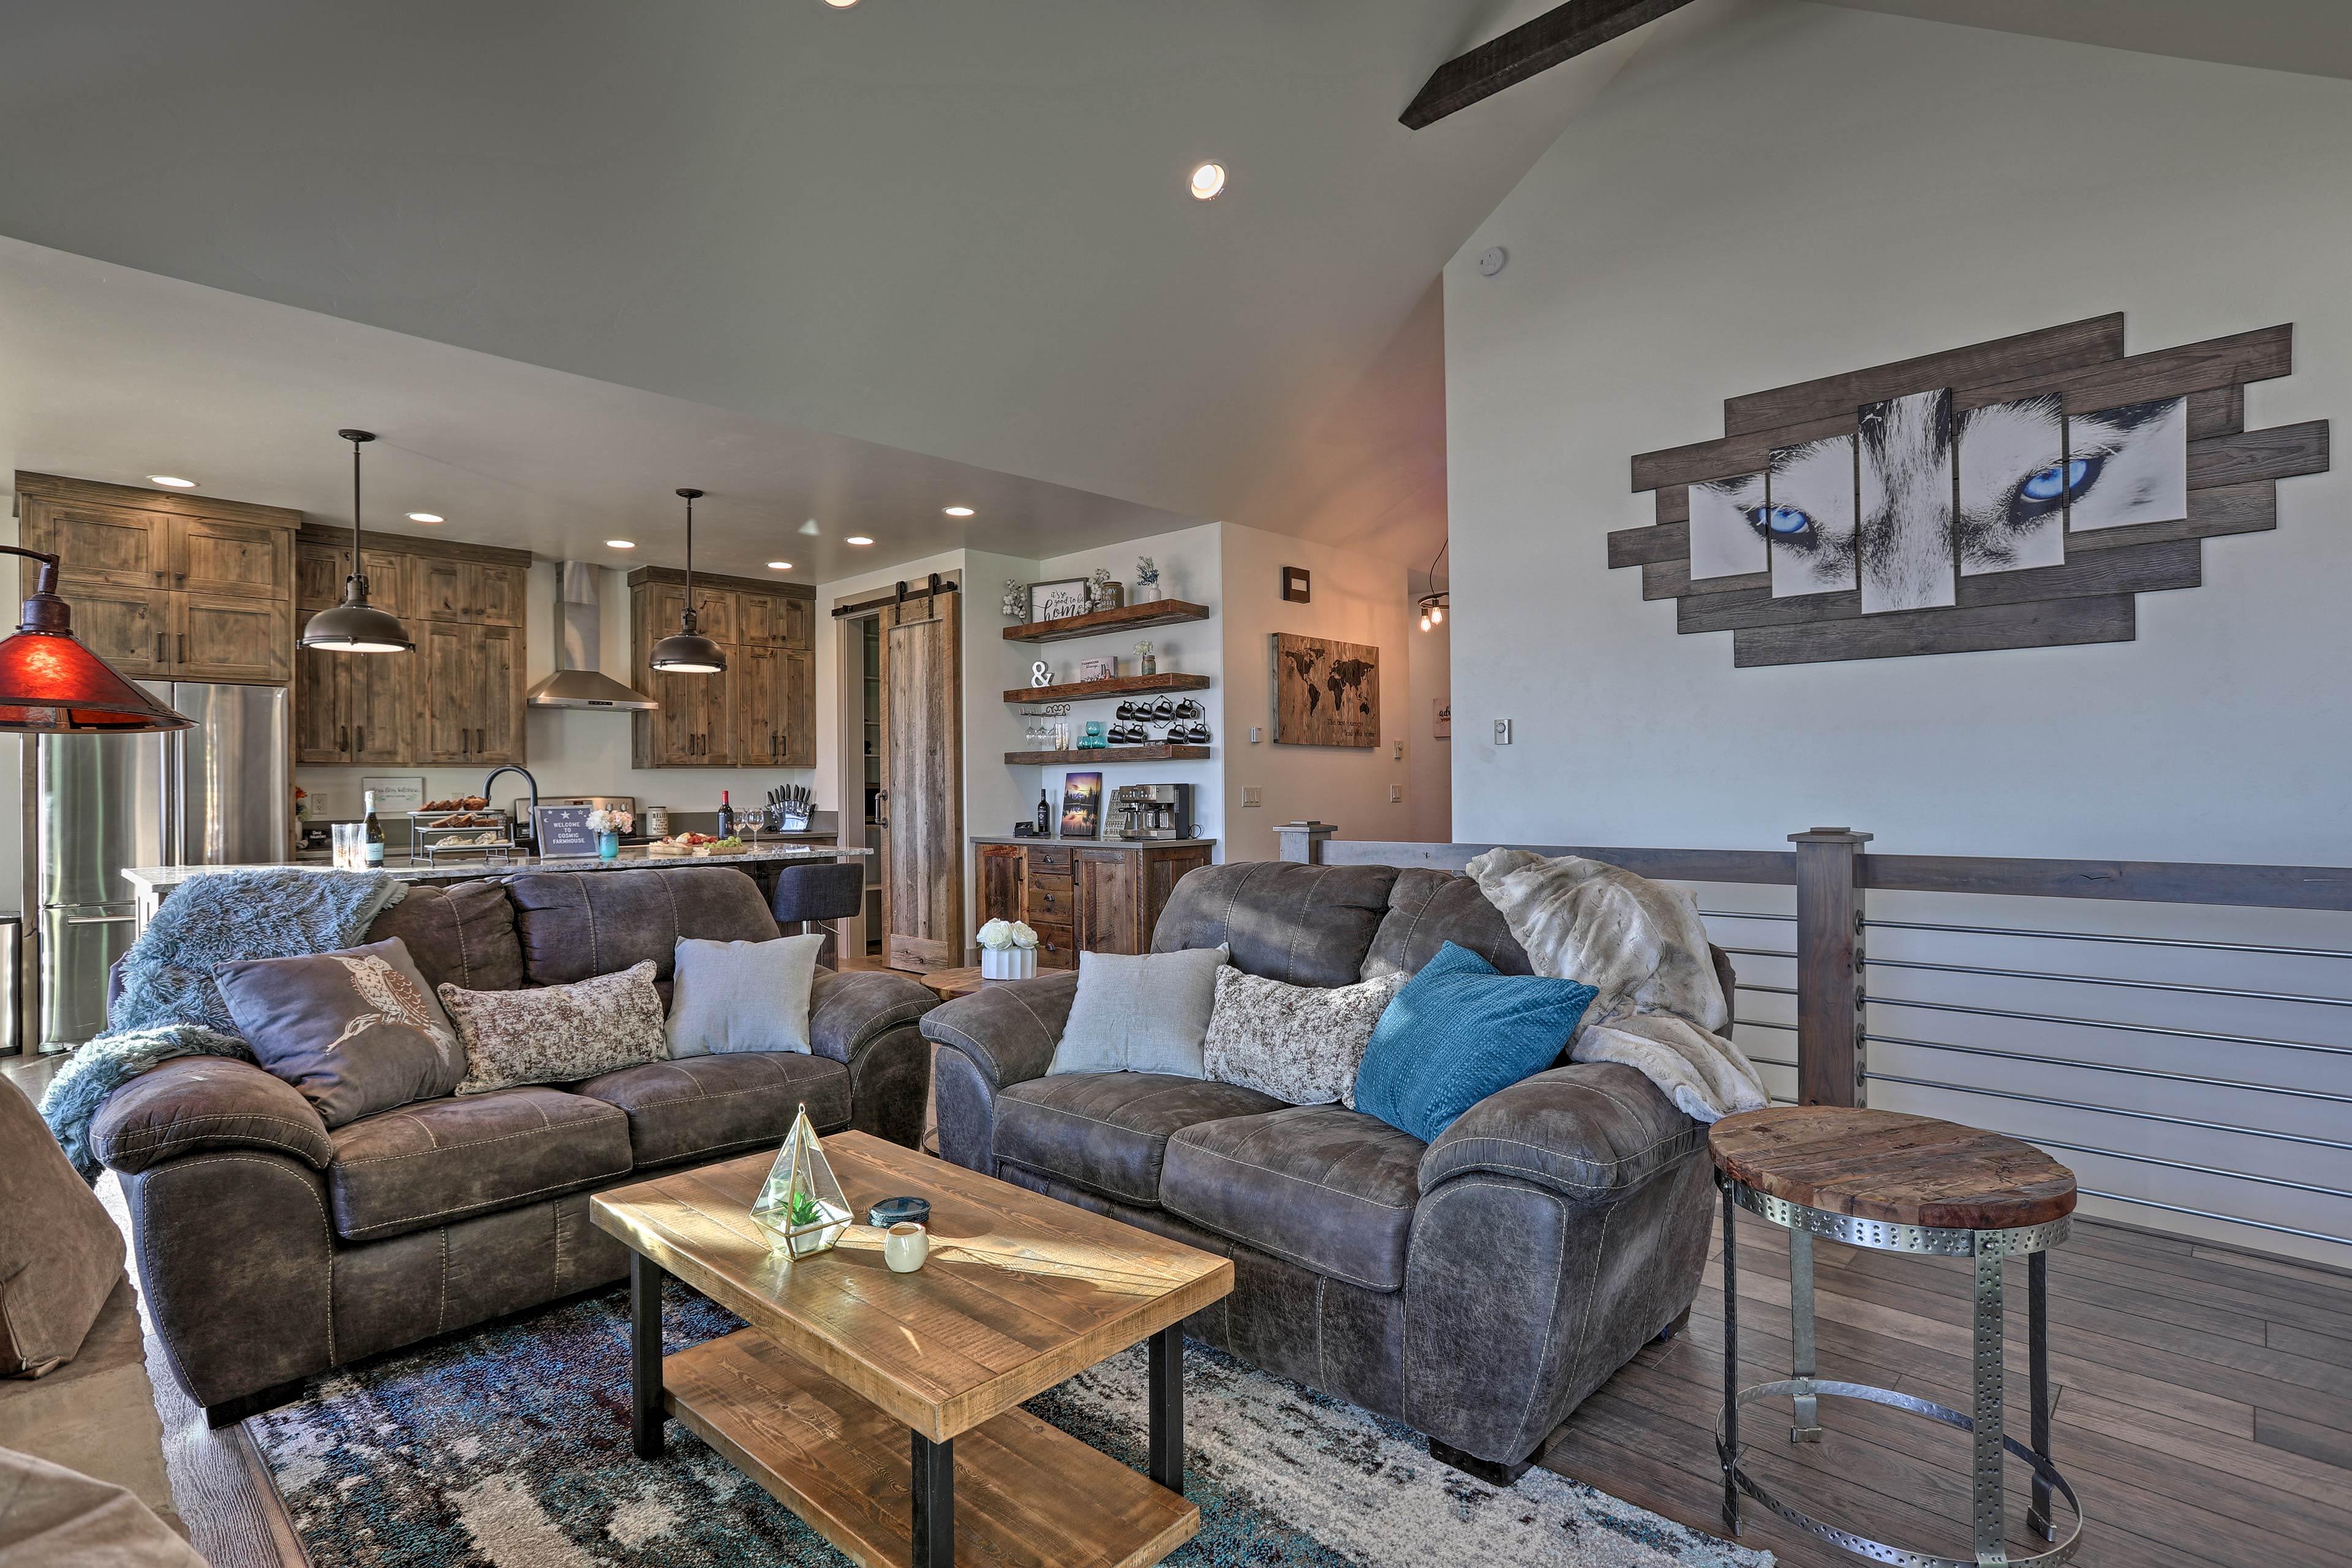 The open-concept living space boasts unique, tasteful decor.